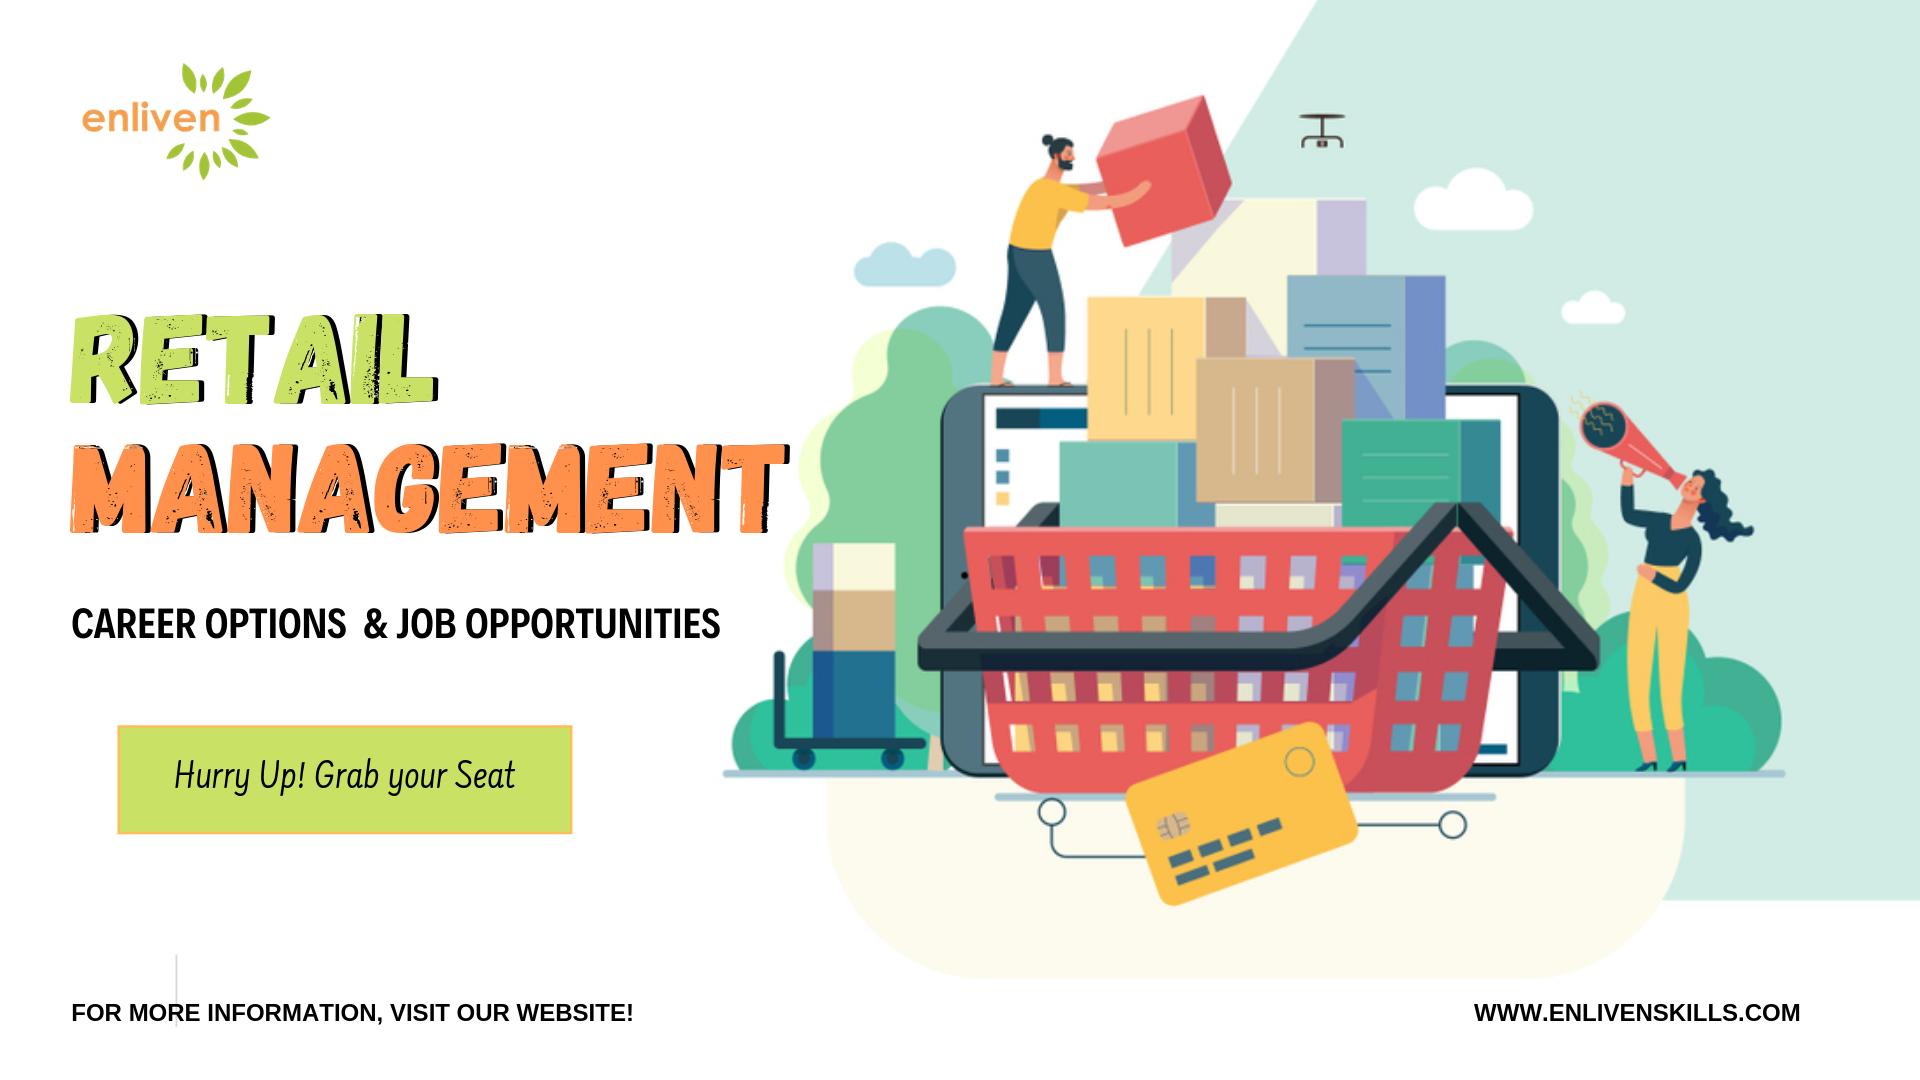 Retail Management training program